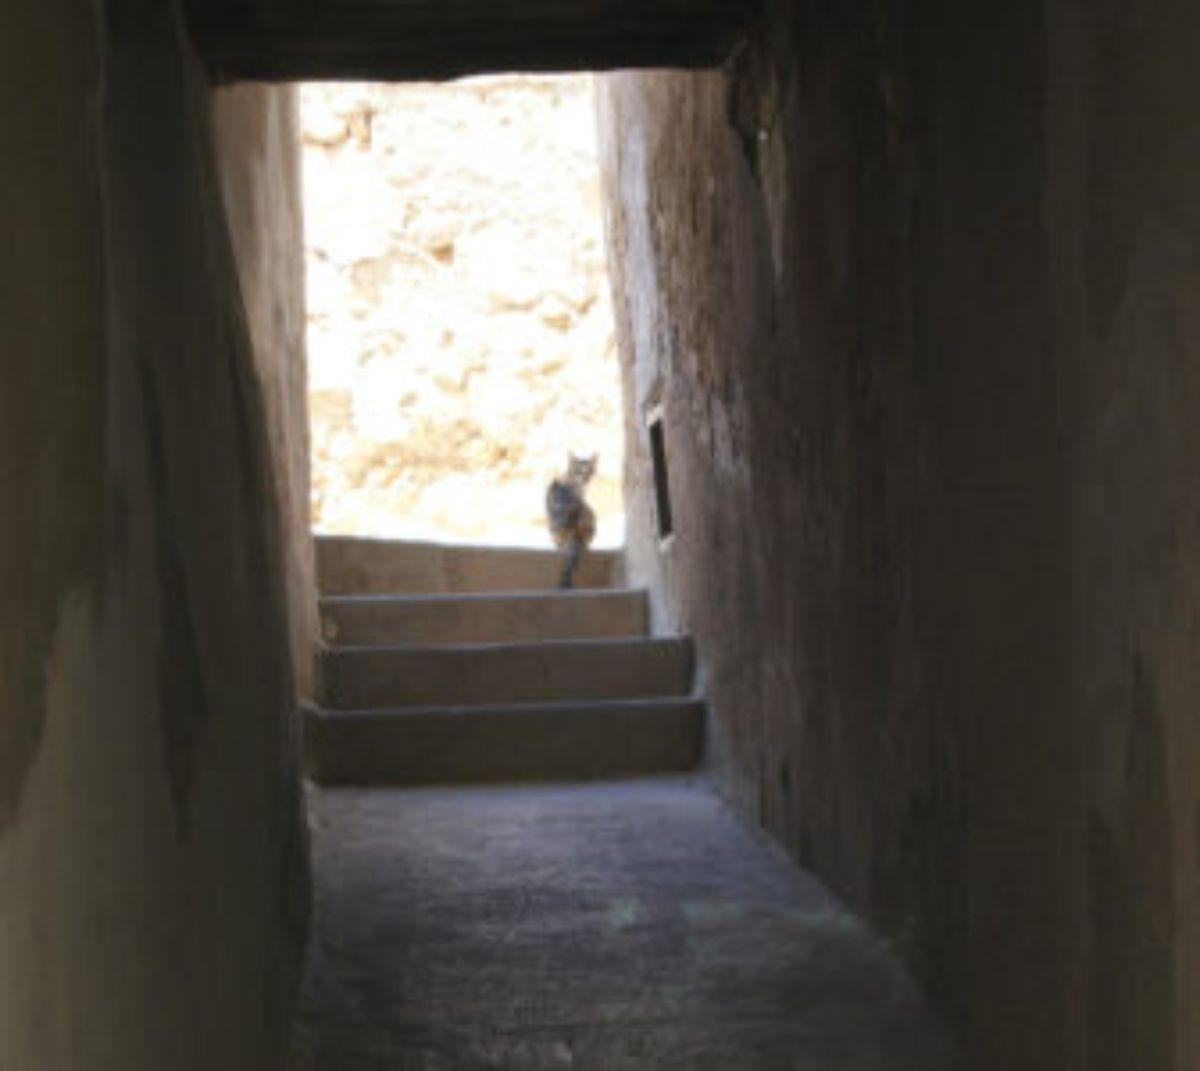 albalate-lucha-atajar-aumento-gatos